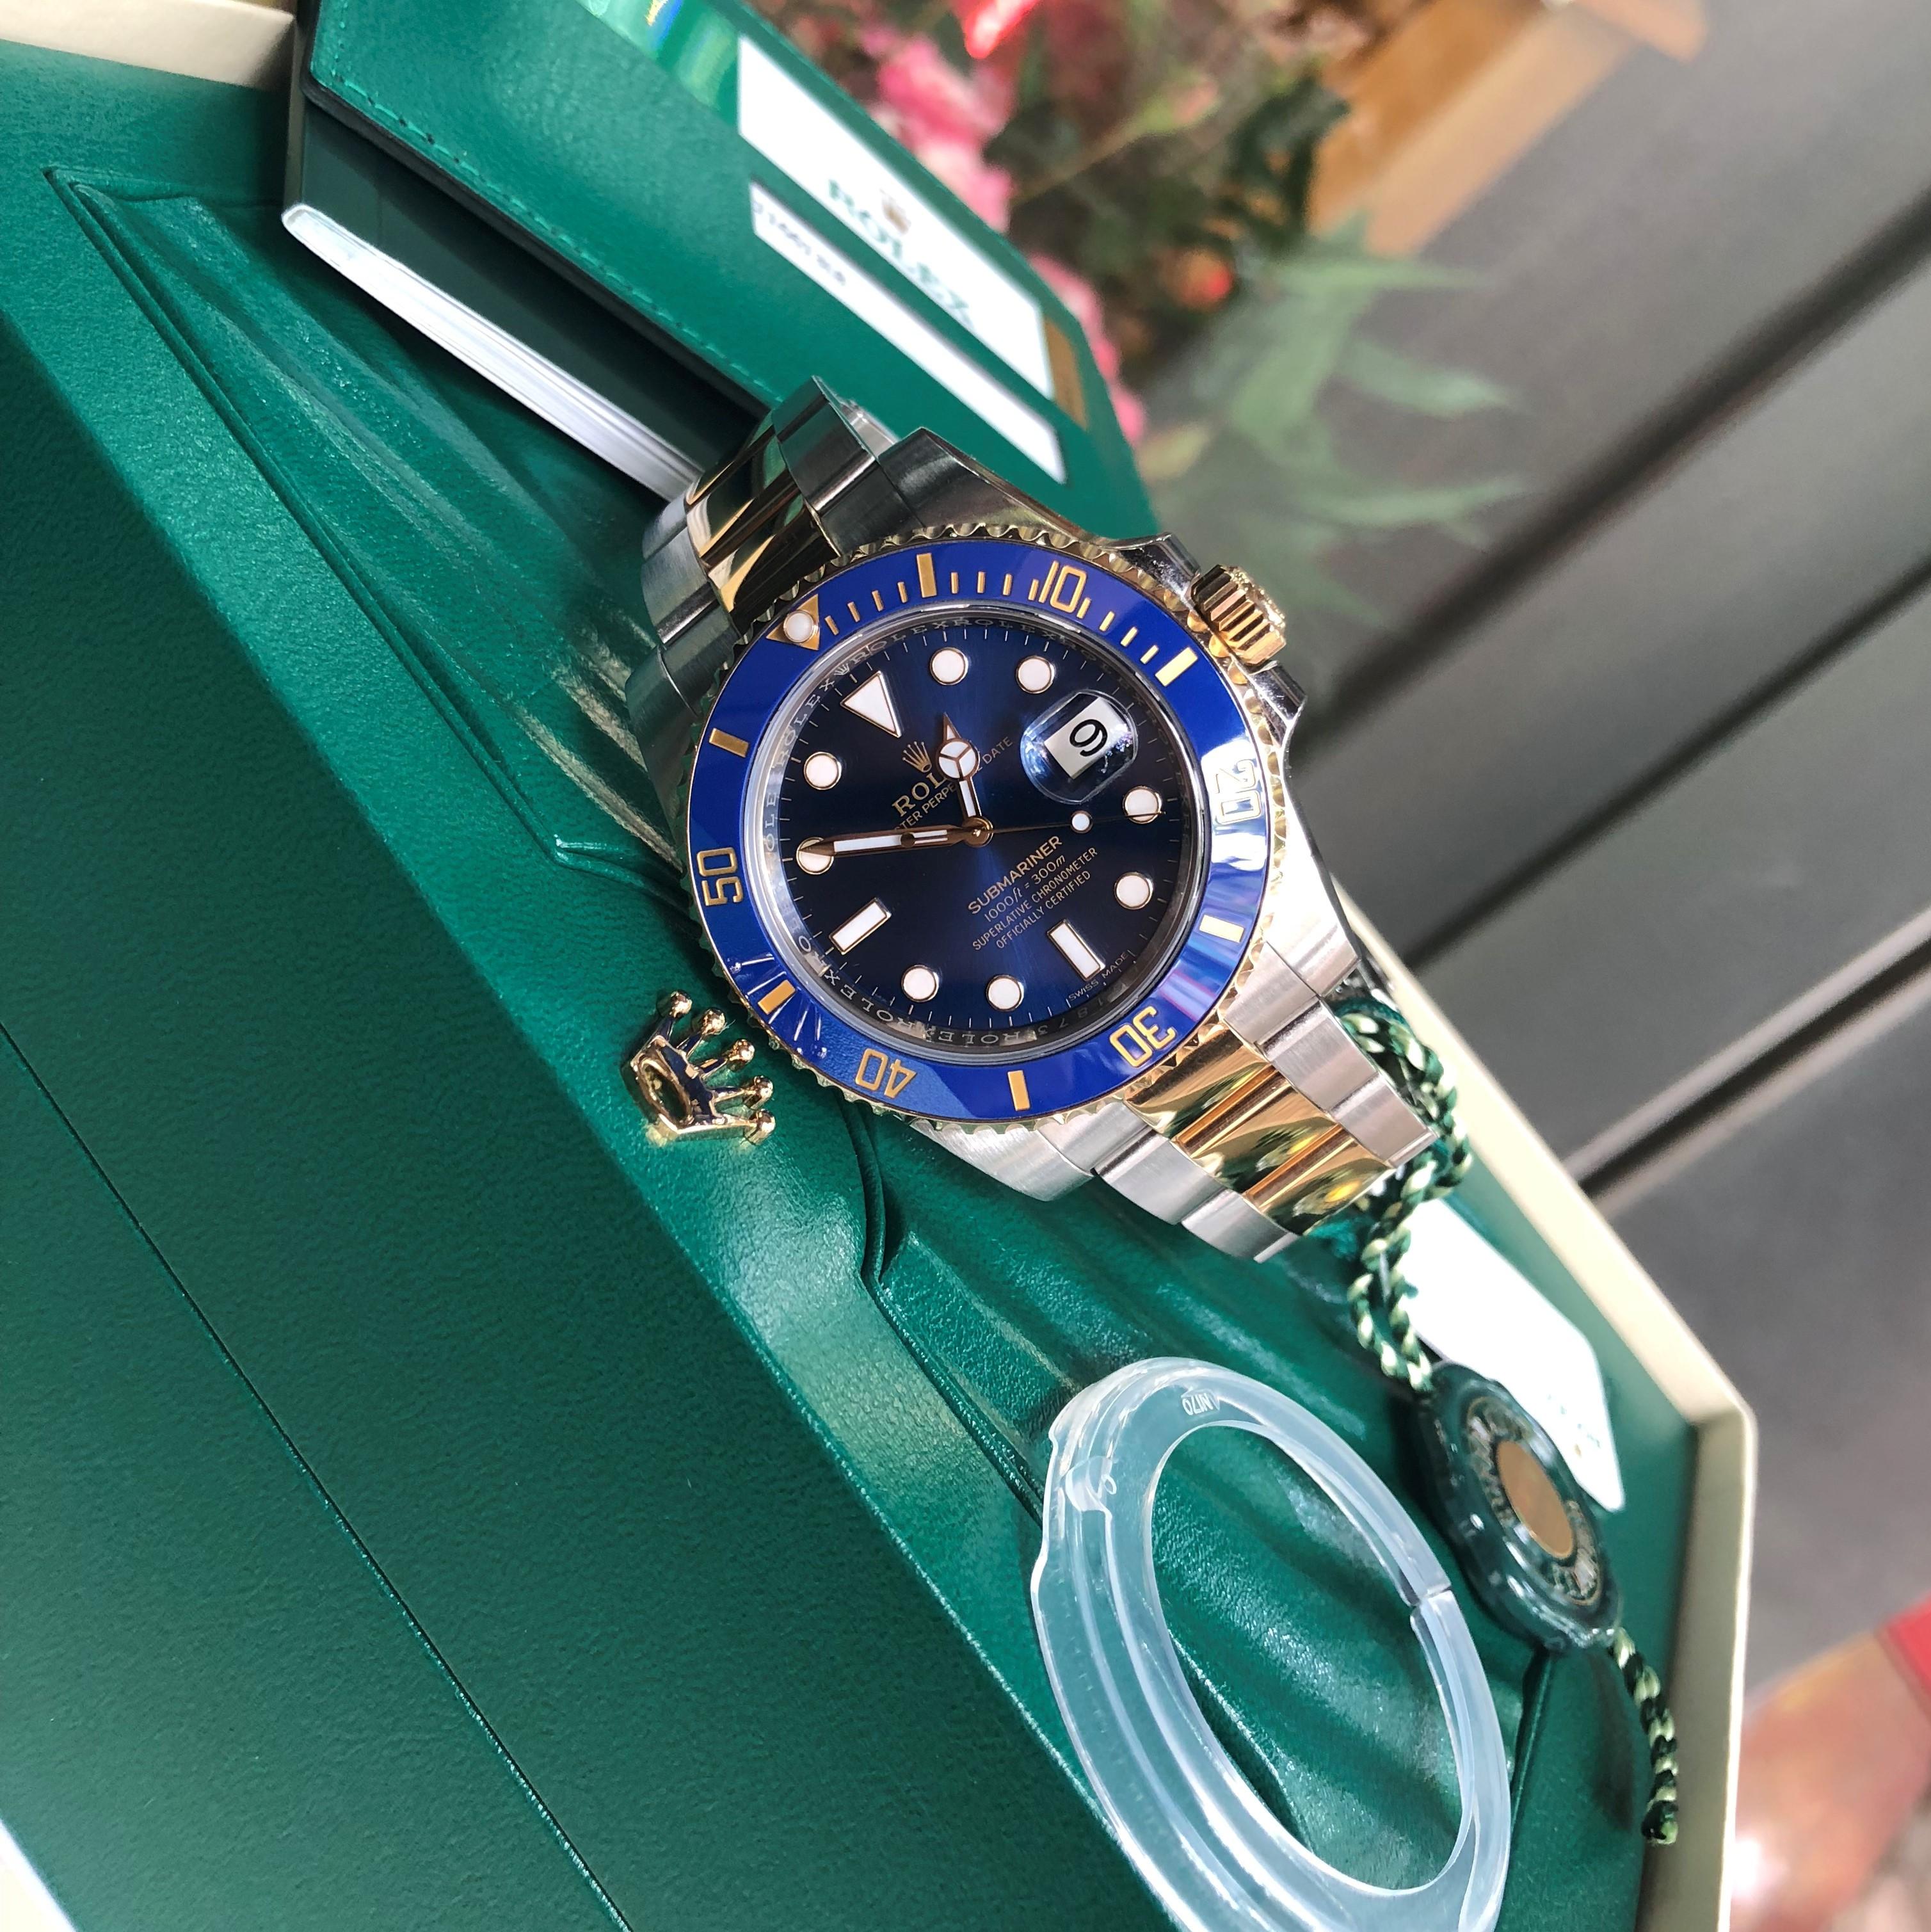 Rolex 116613 mặt xanh dương demi 18k Fullbox đời 2018